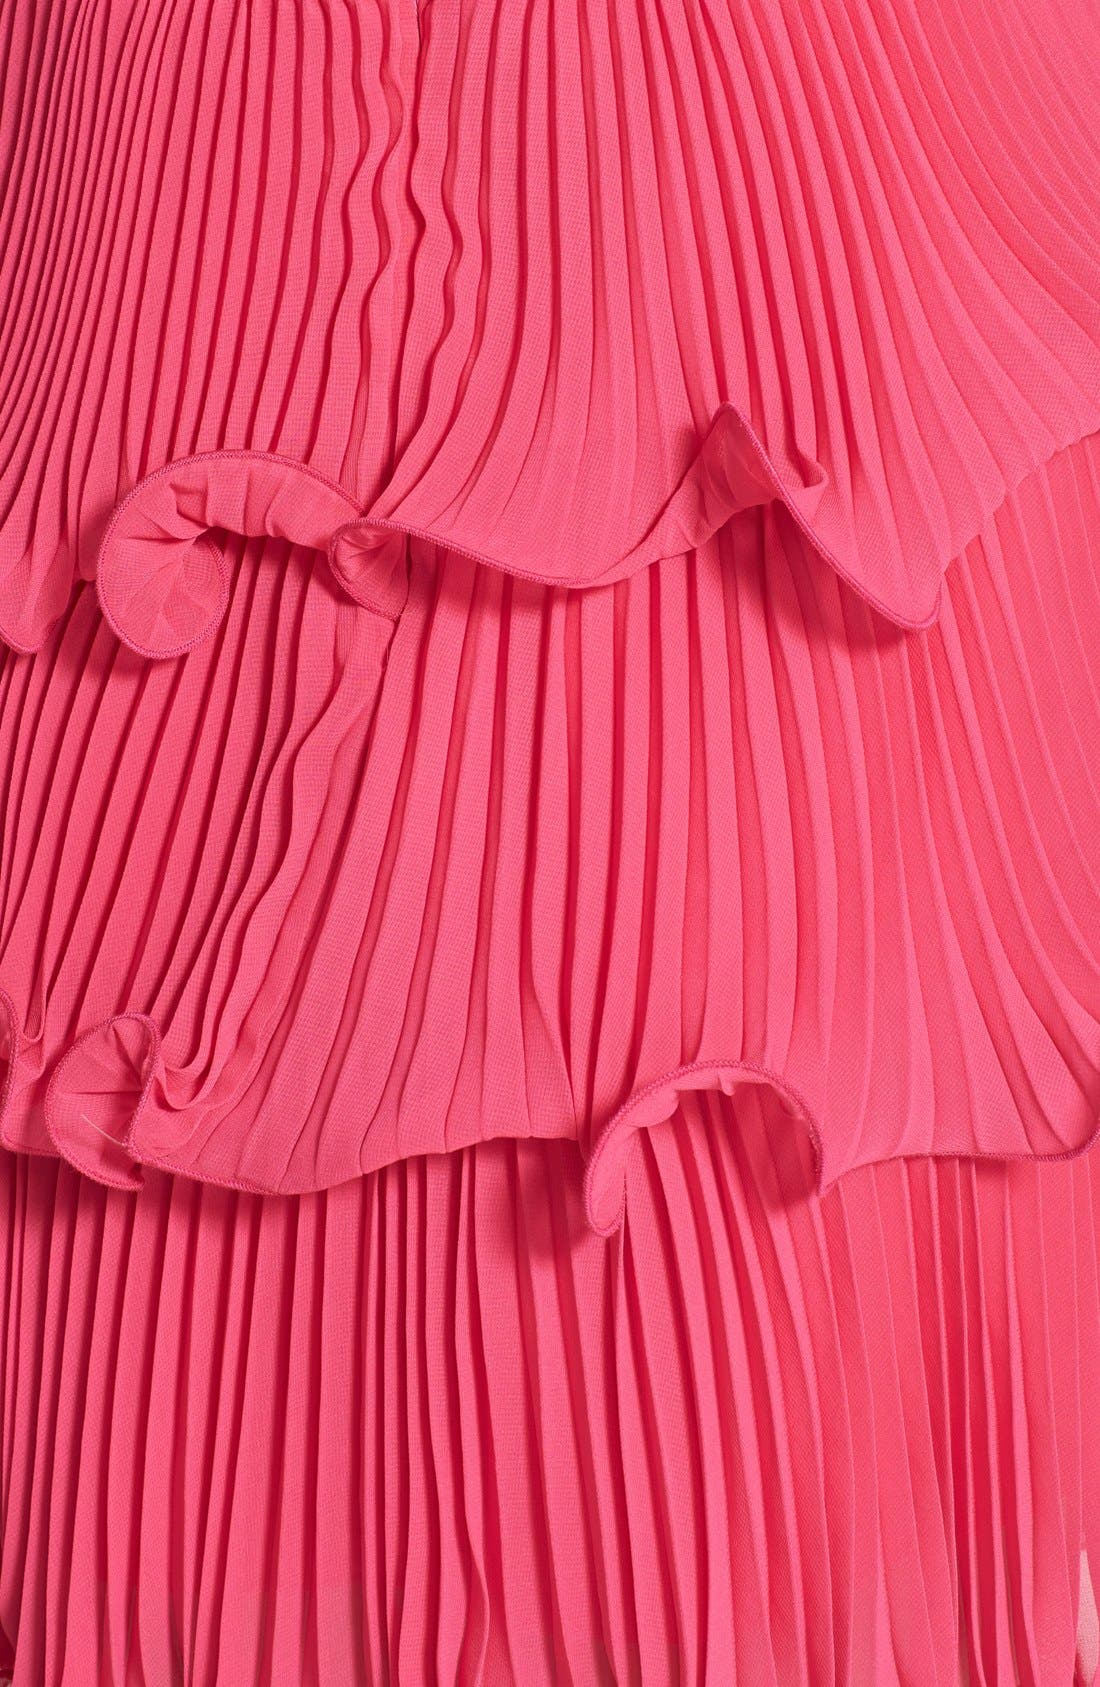 Alternate Image 3  - ERIN erin fetherston 'Sweet Pea' Chiffon Dress